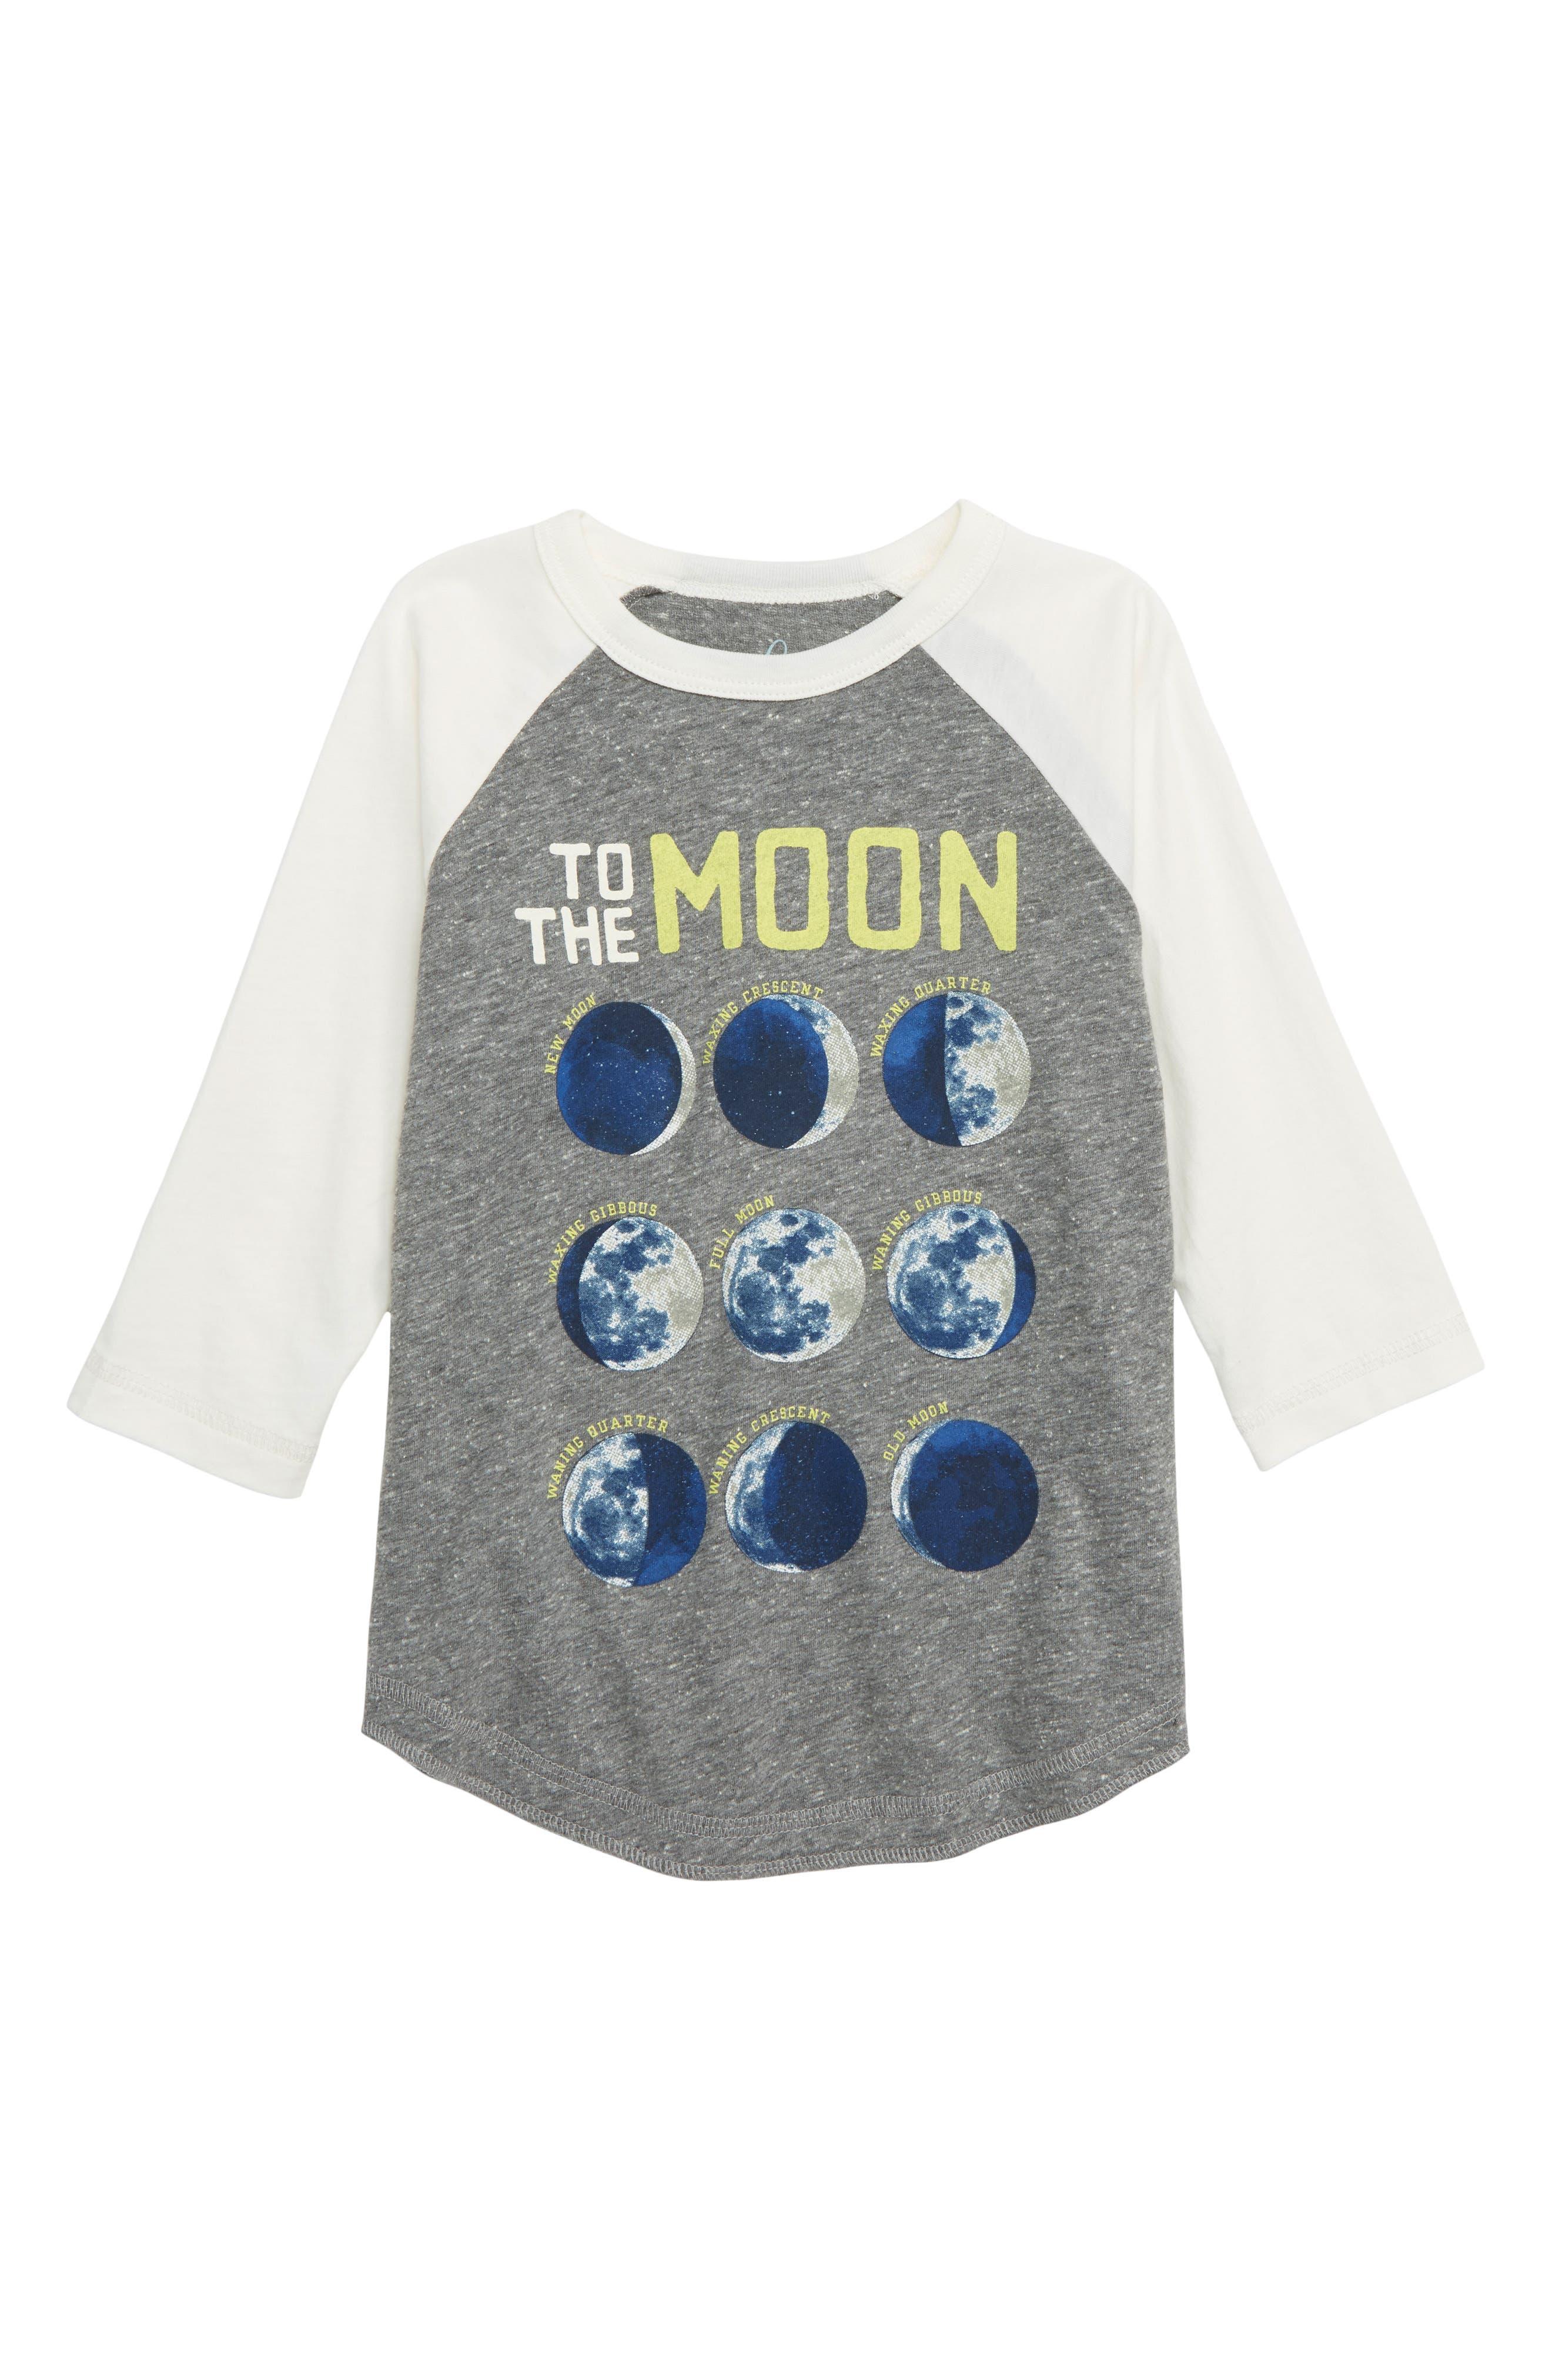 PEEK AREN'T YOU CURIOUS Moon & Back Glow in the Dark Raglan T-Shirt, Main, color, 020